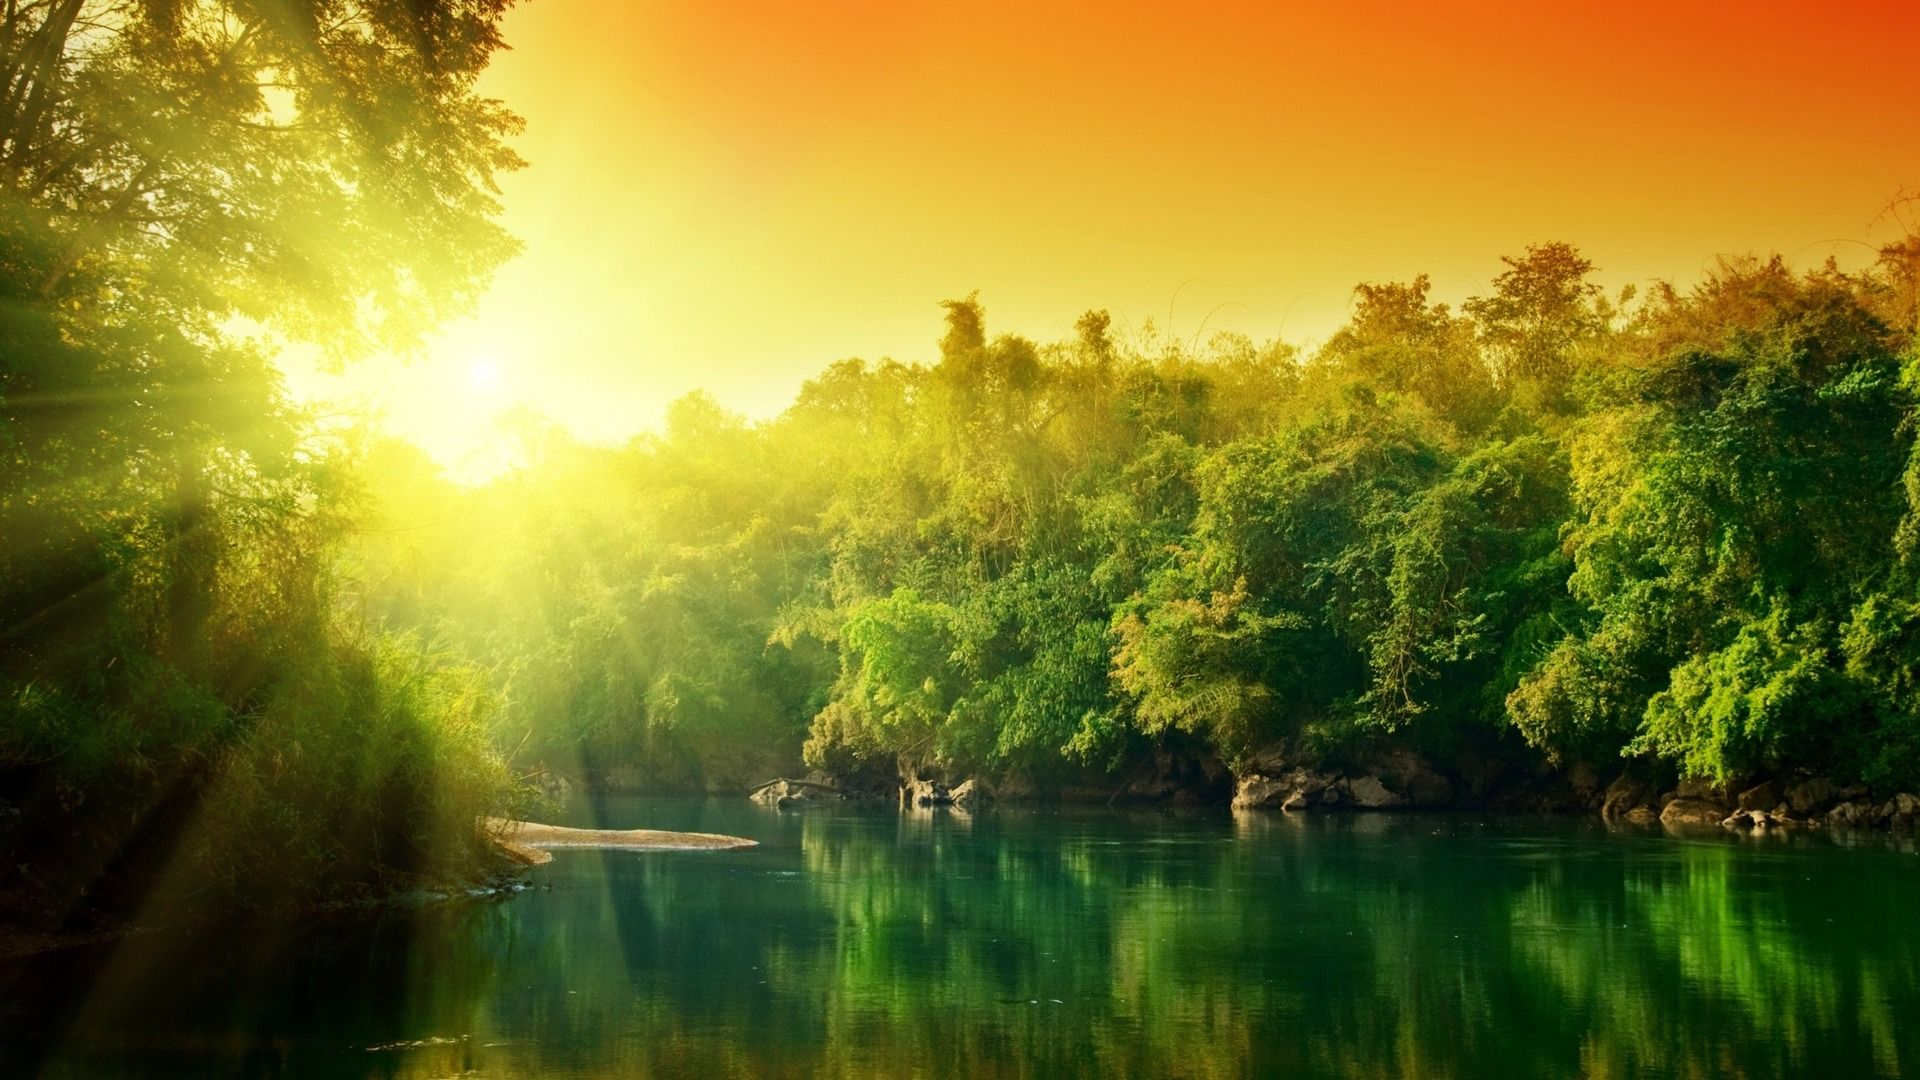 sunrise images free download